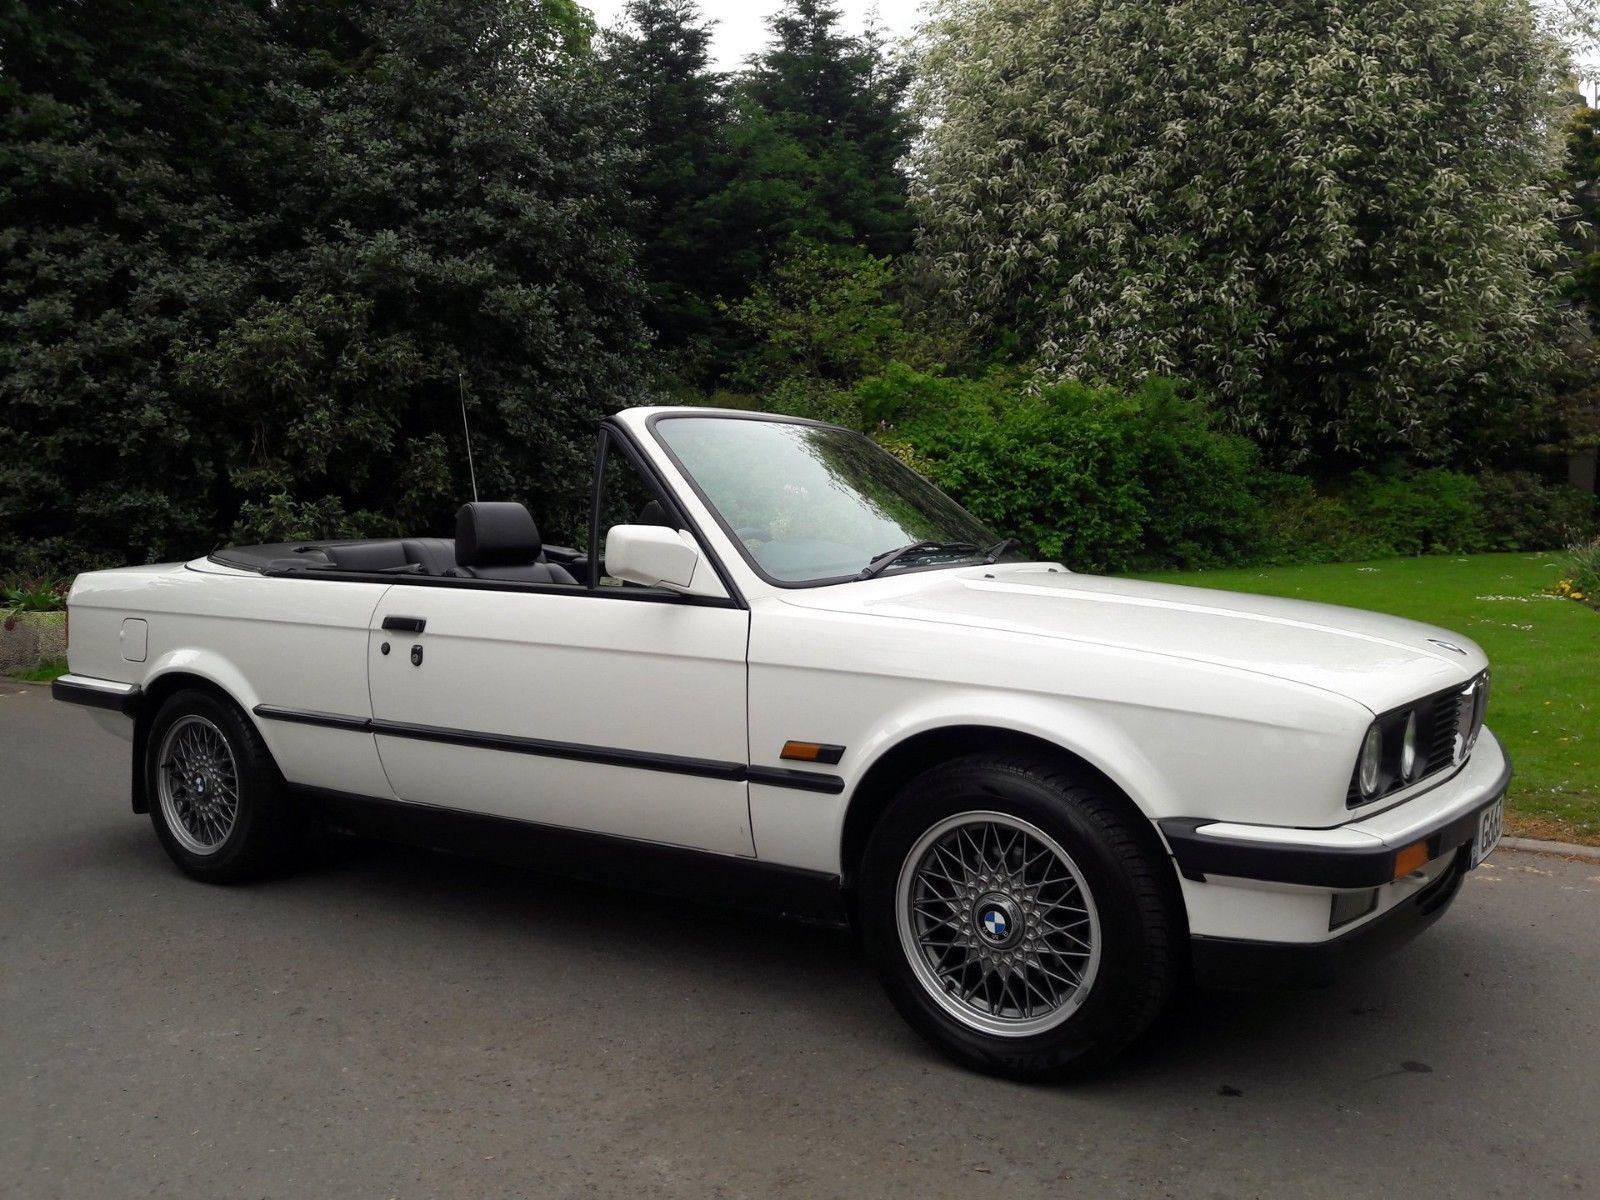 Ebay 1990 E30 Bmw 325i Cabriolet Auto White Convertible Family